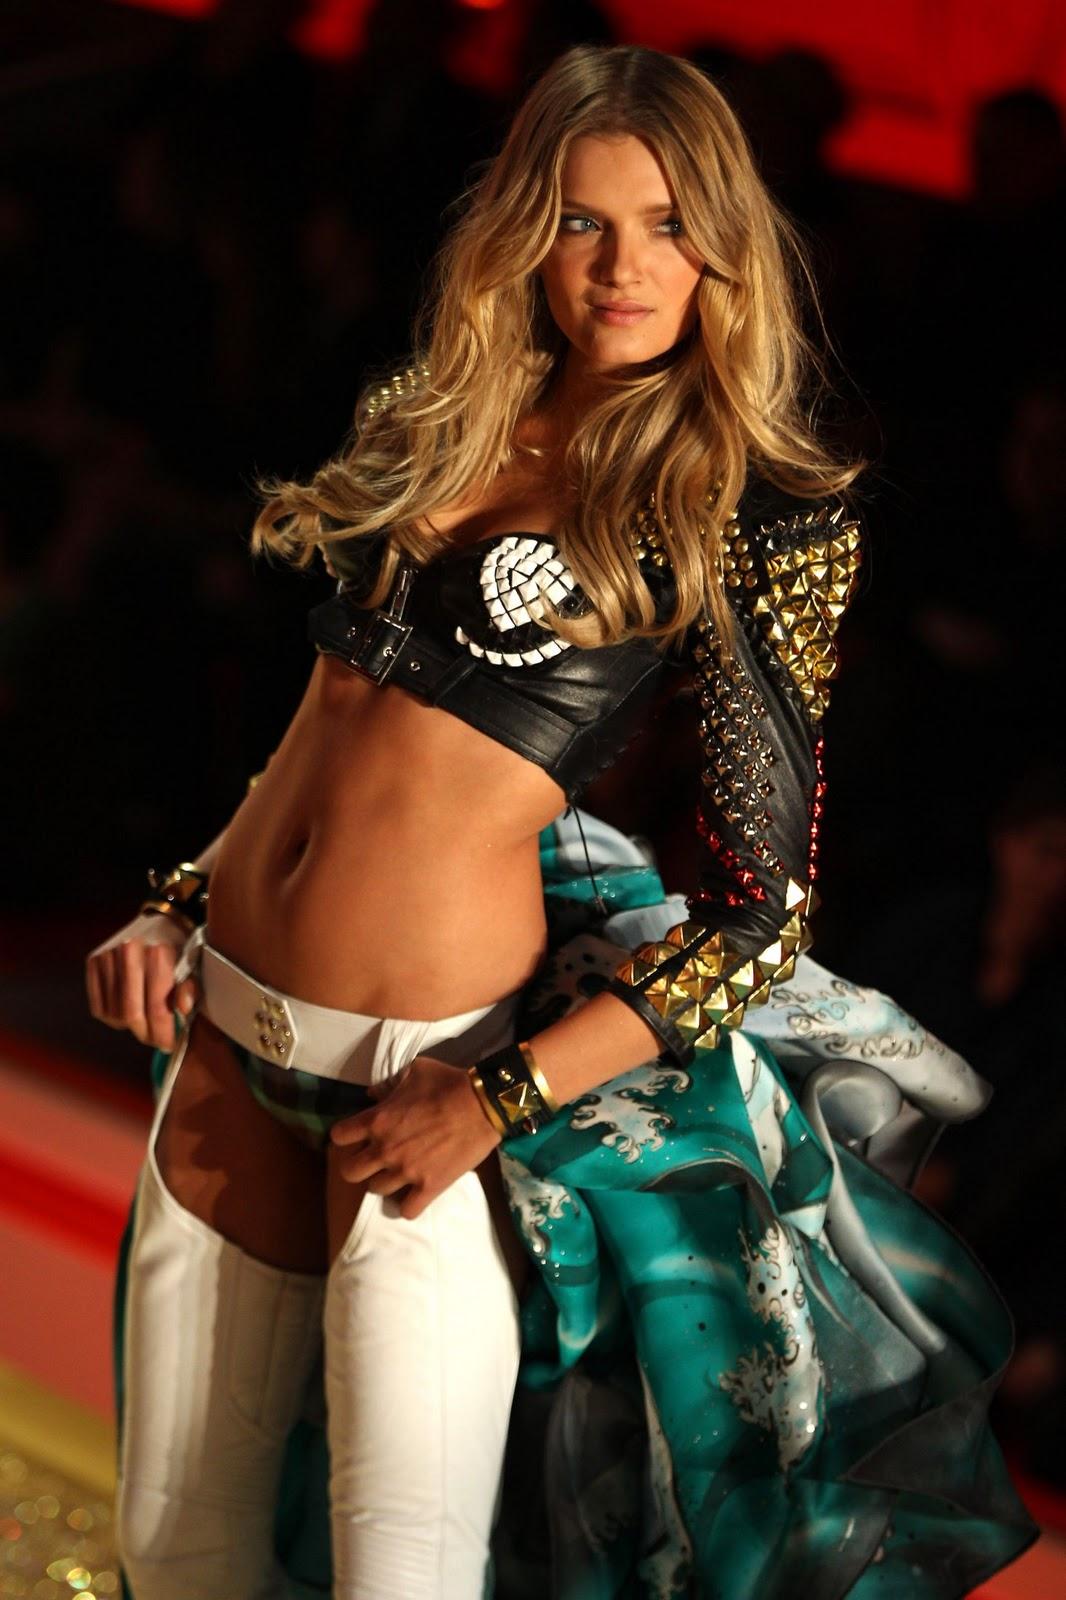 http://4.bp.blogspot.com/-JnlU328cIE4/TVTNpNsC0BI/AAAAAAAAG8w/hUPj9giOe8o/s1600/Lily+Donaldson+%2528Victoria%2527s+Secret+Fashion+Show+201011%2529+HQ+%25282%2529.jpg